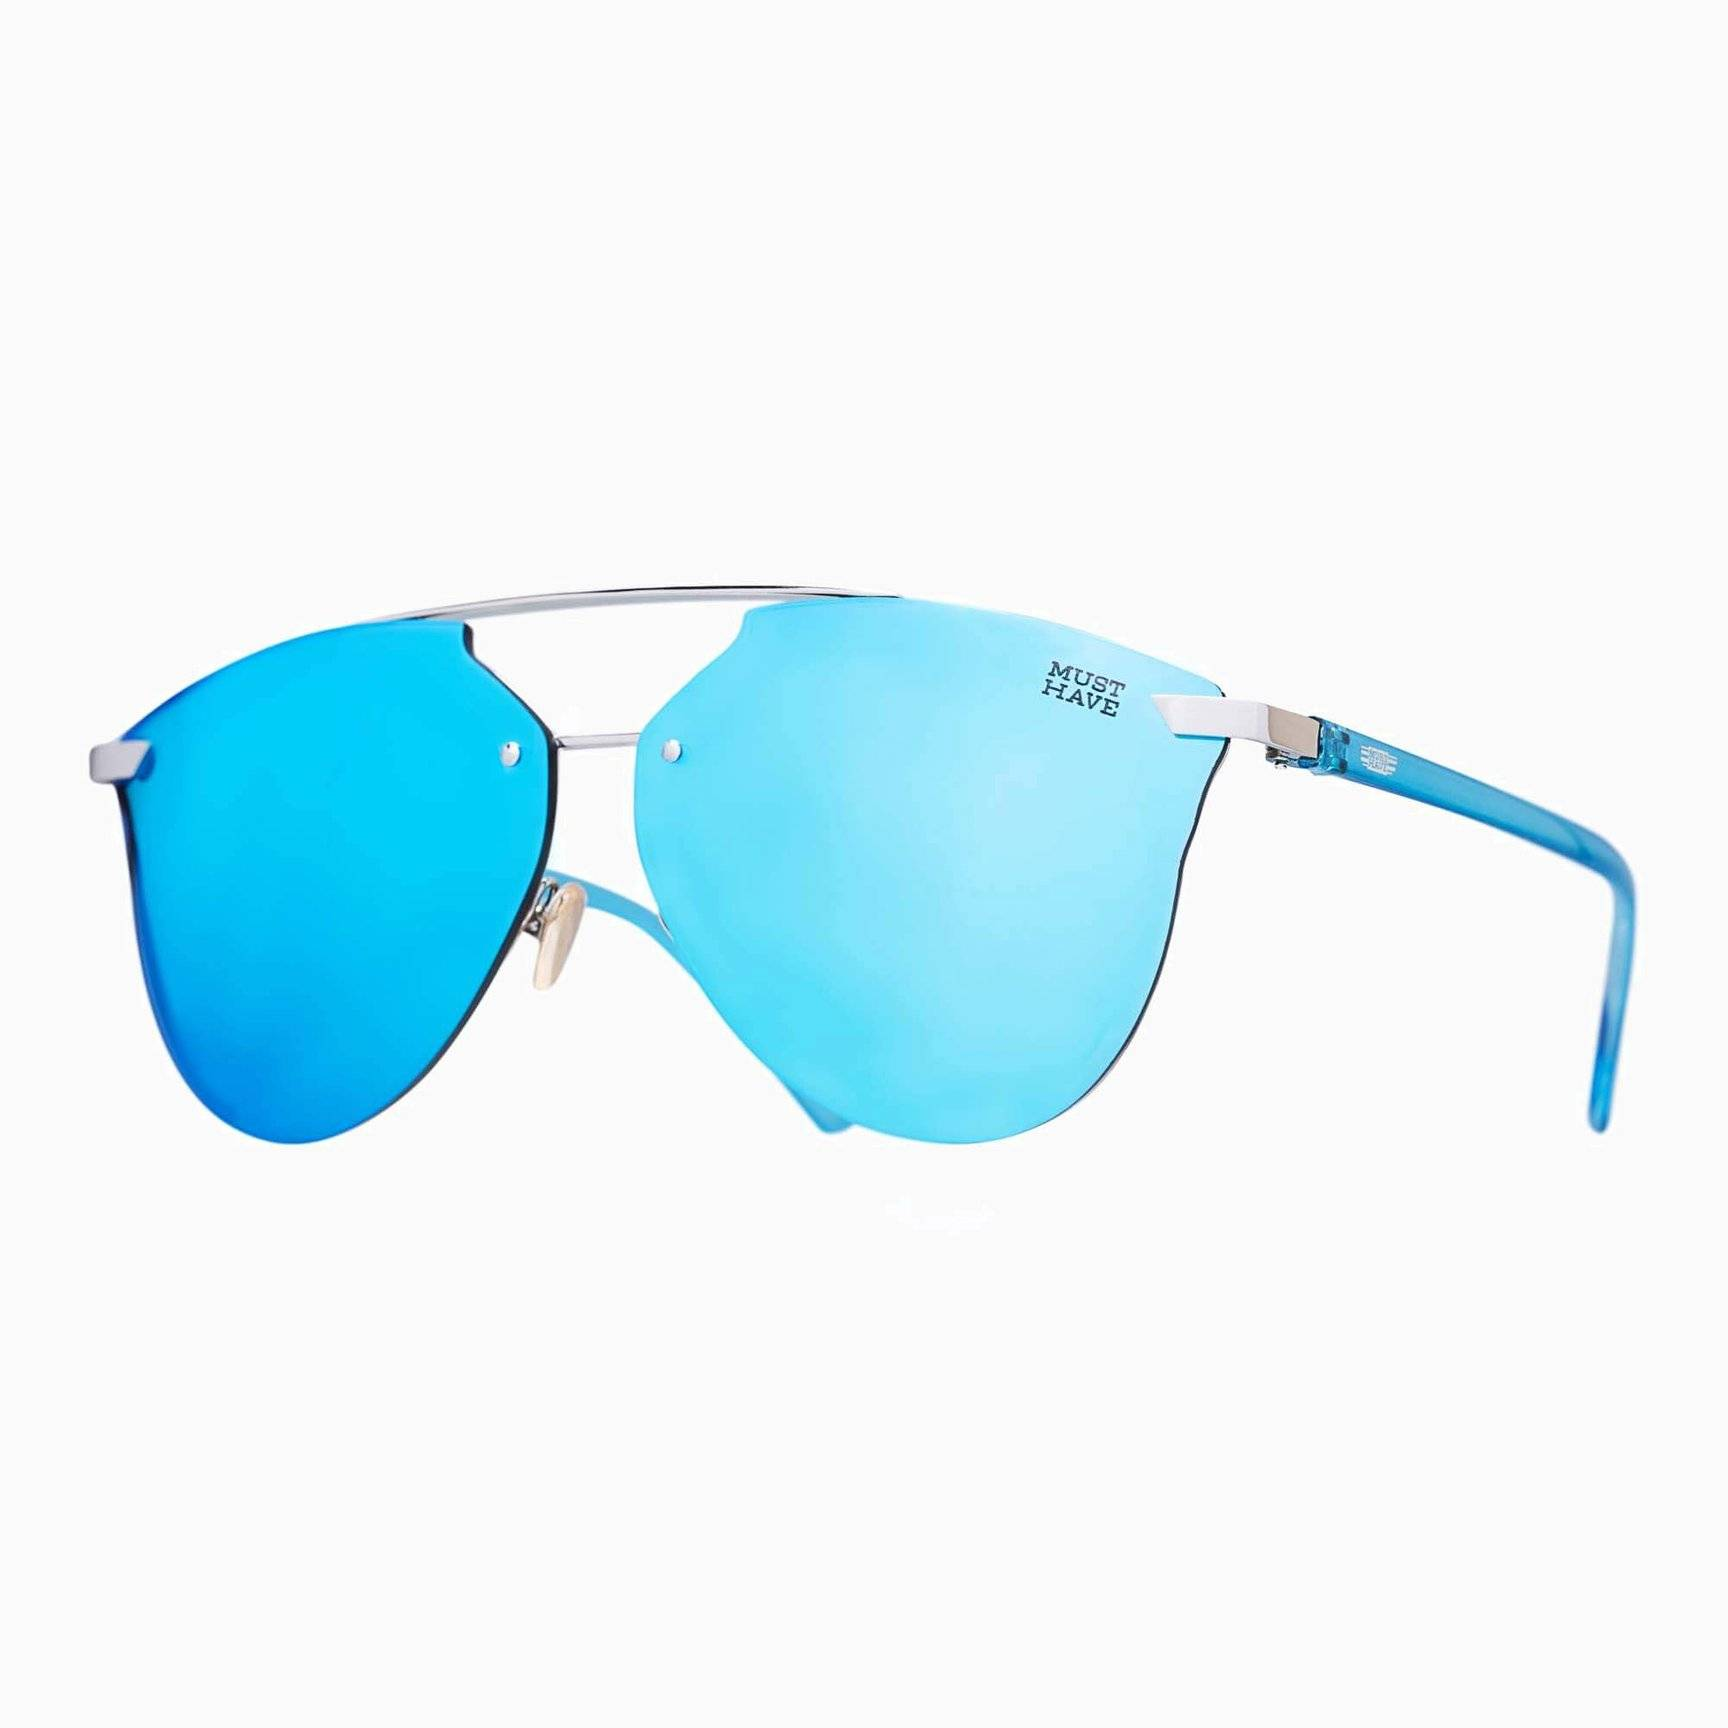 https://cdn.shopify.com/s/files/1/0051/0708/9481/products/mh-itsamust-blue-front_1080x.jpg?v=1546592785